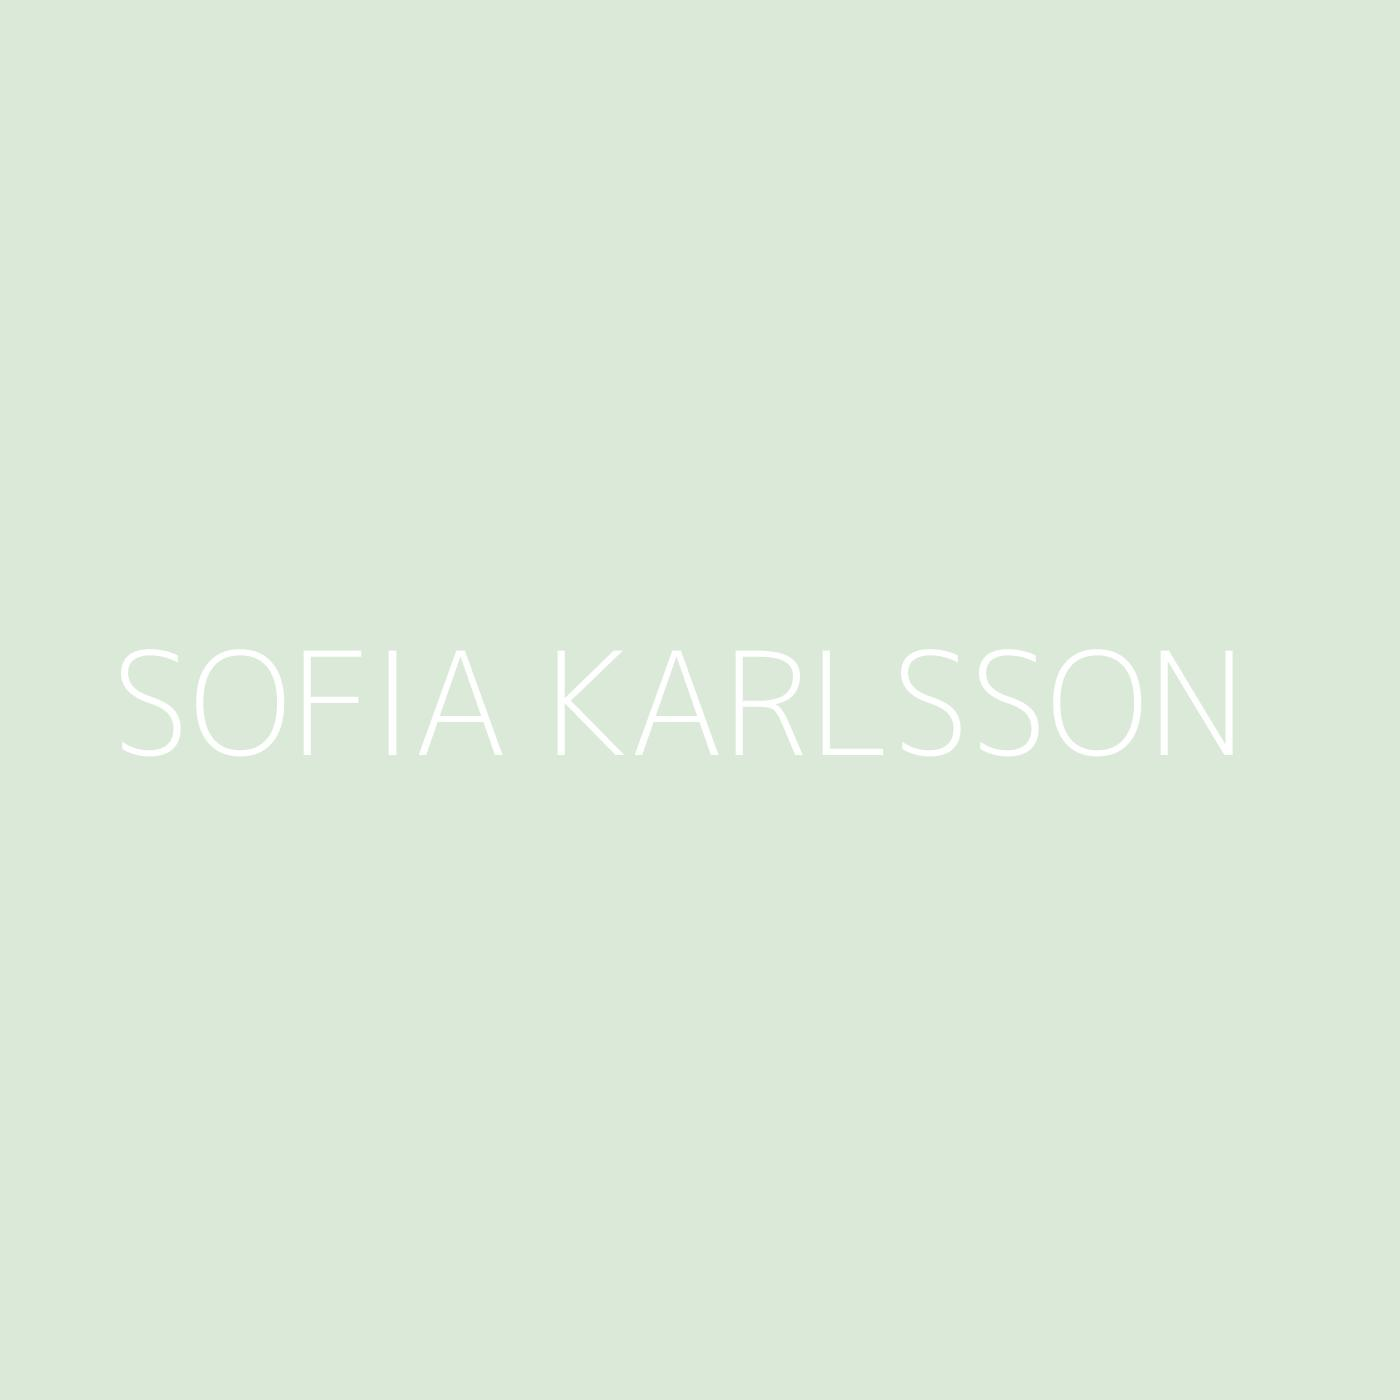 Sofia Karlsson Playlist Artwork